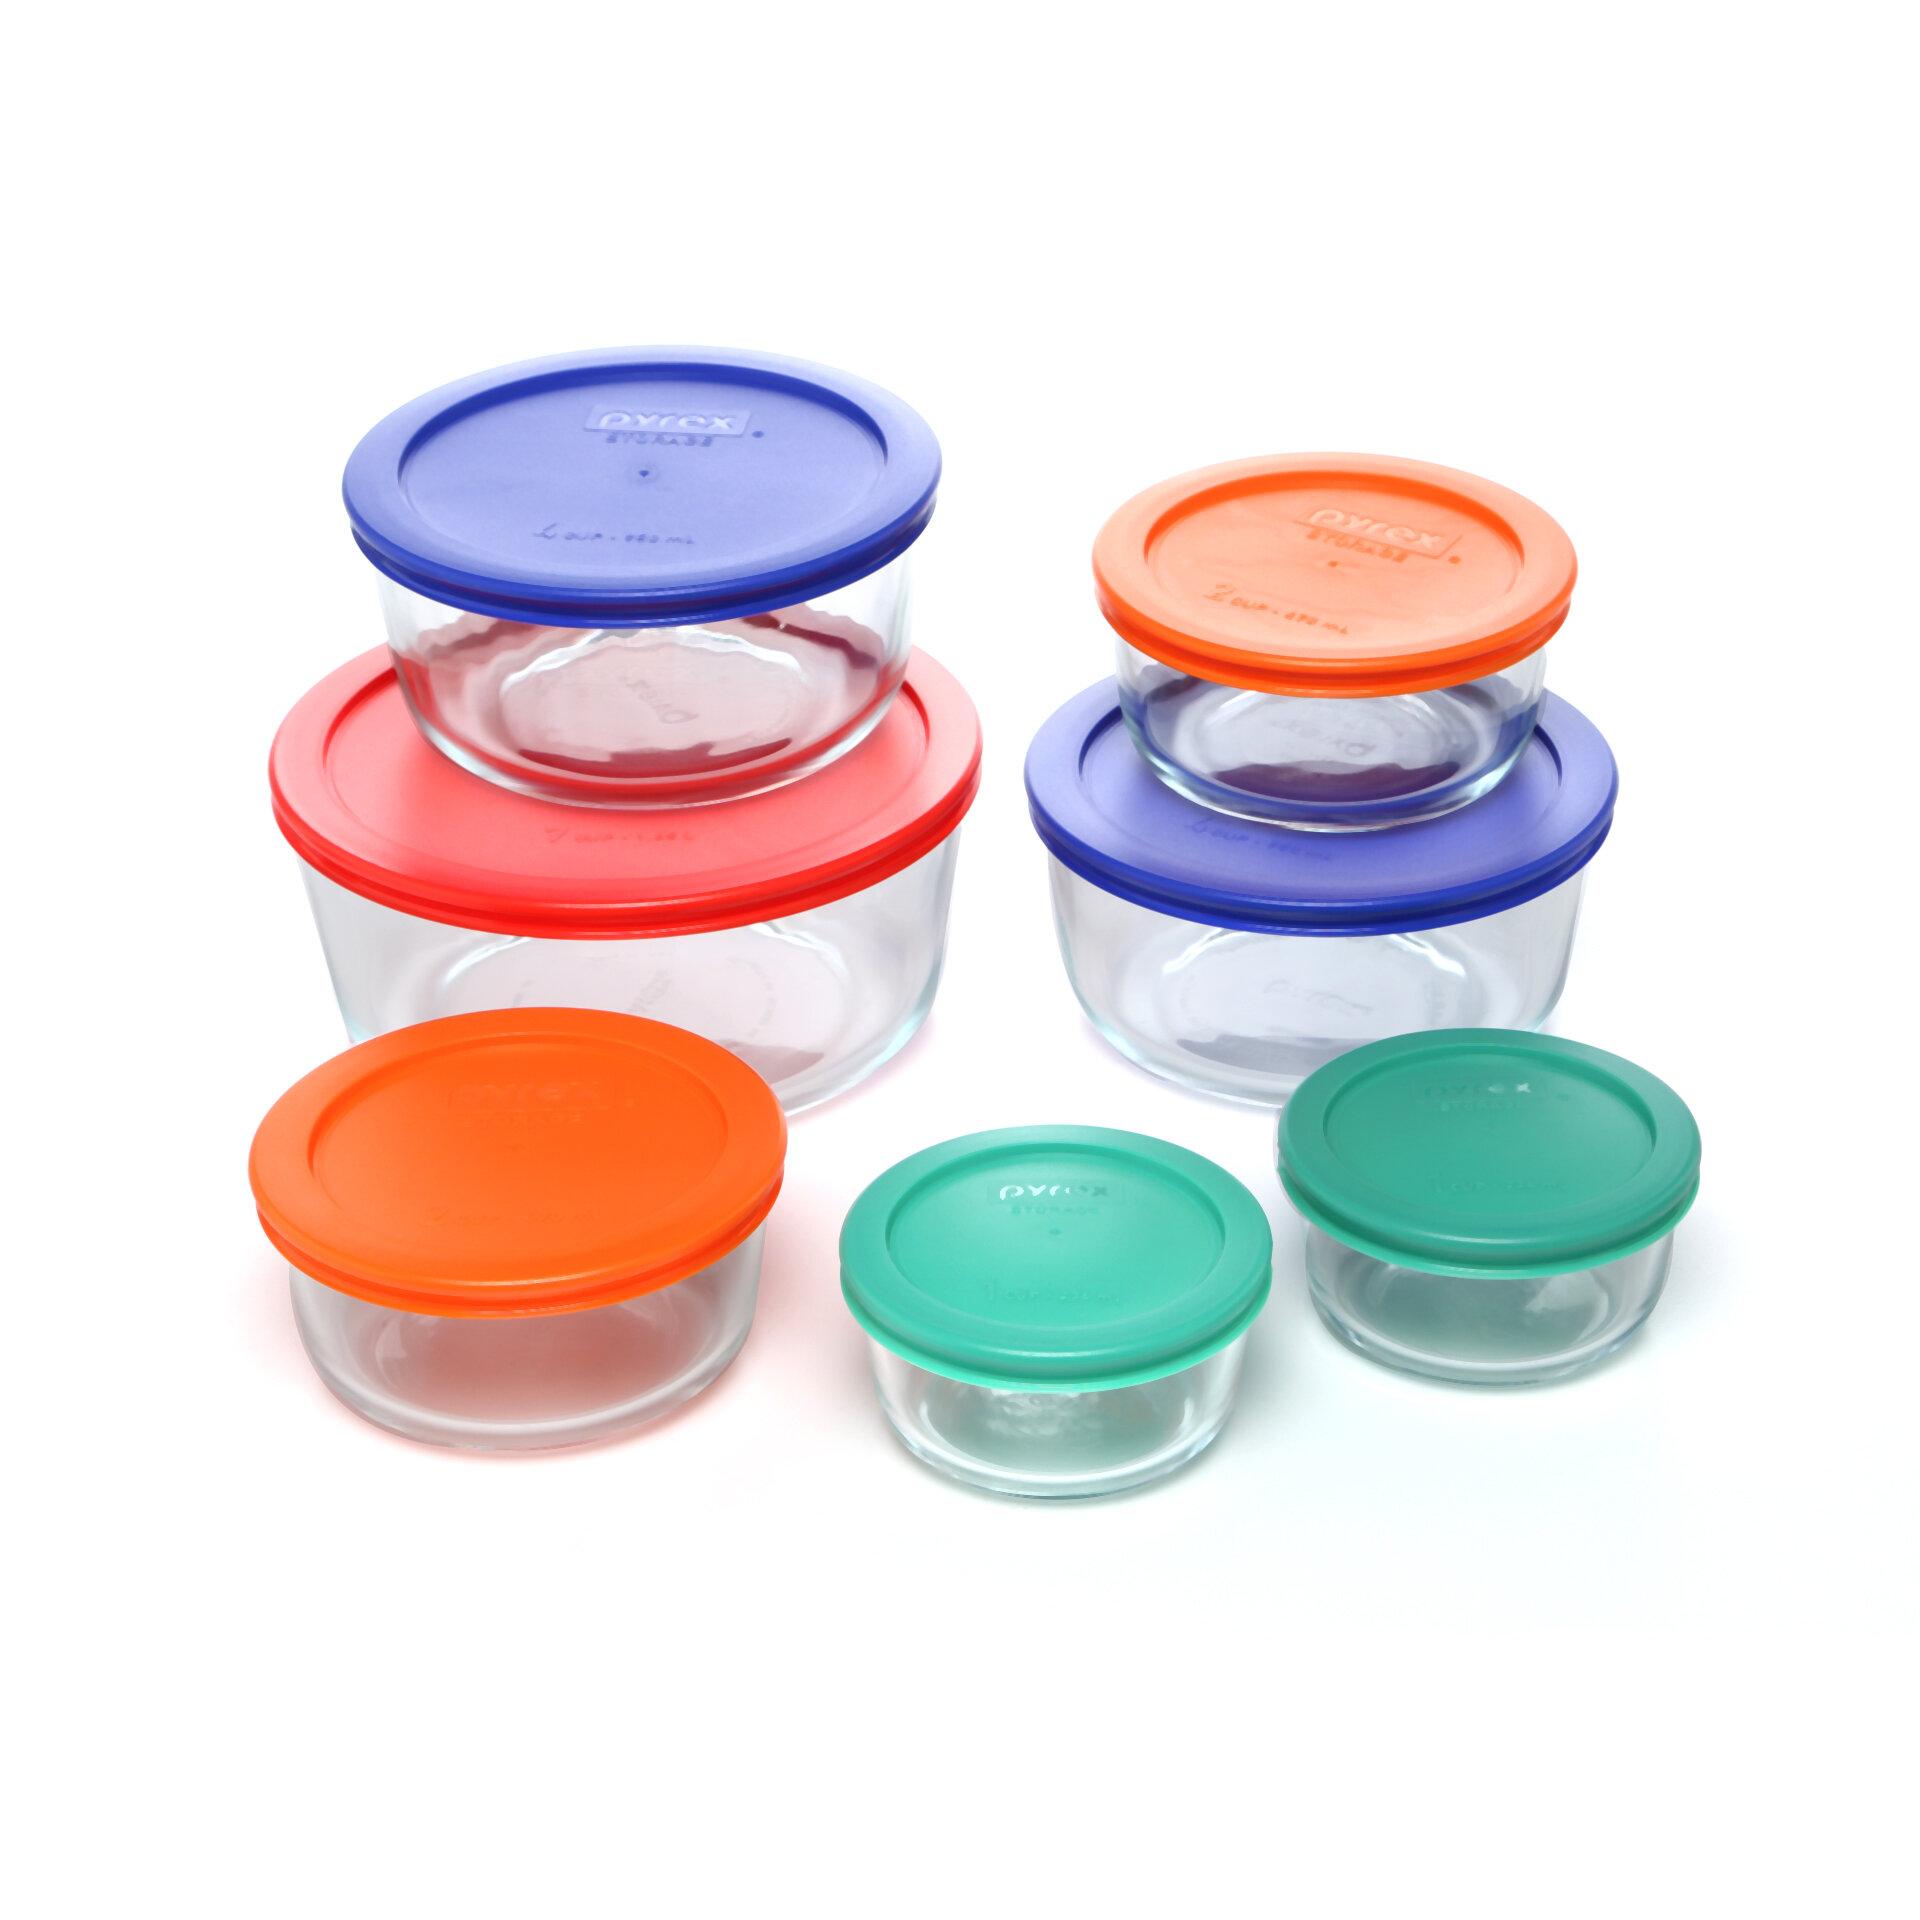 c260b2909c62 Pyrex Storage Plus 7 Container Food Storage Set   Reviews